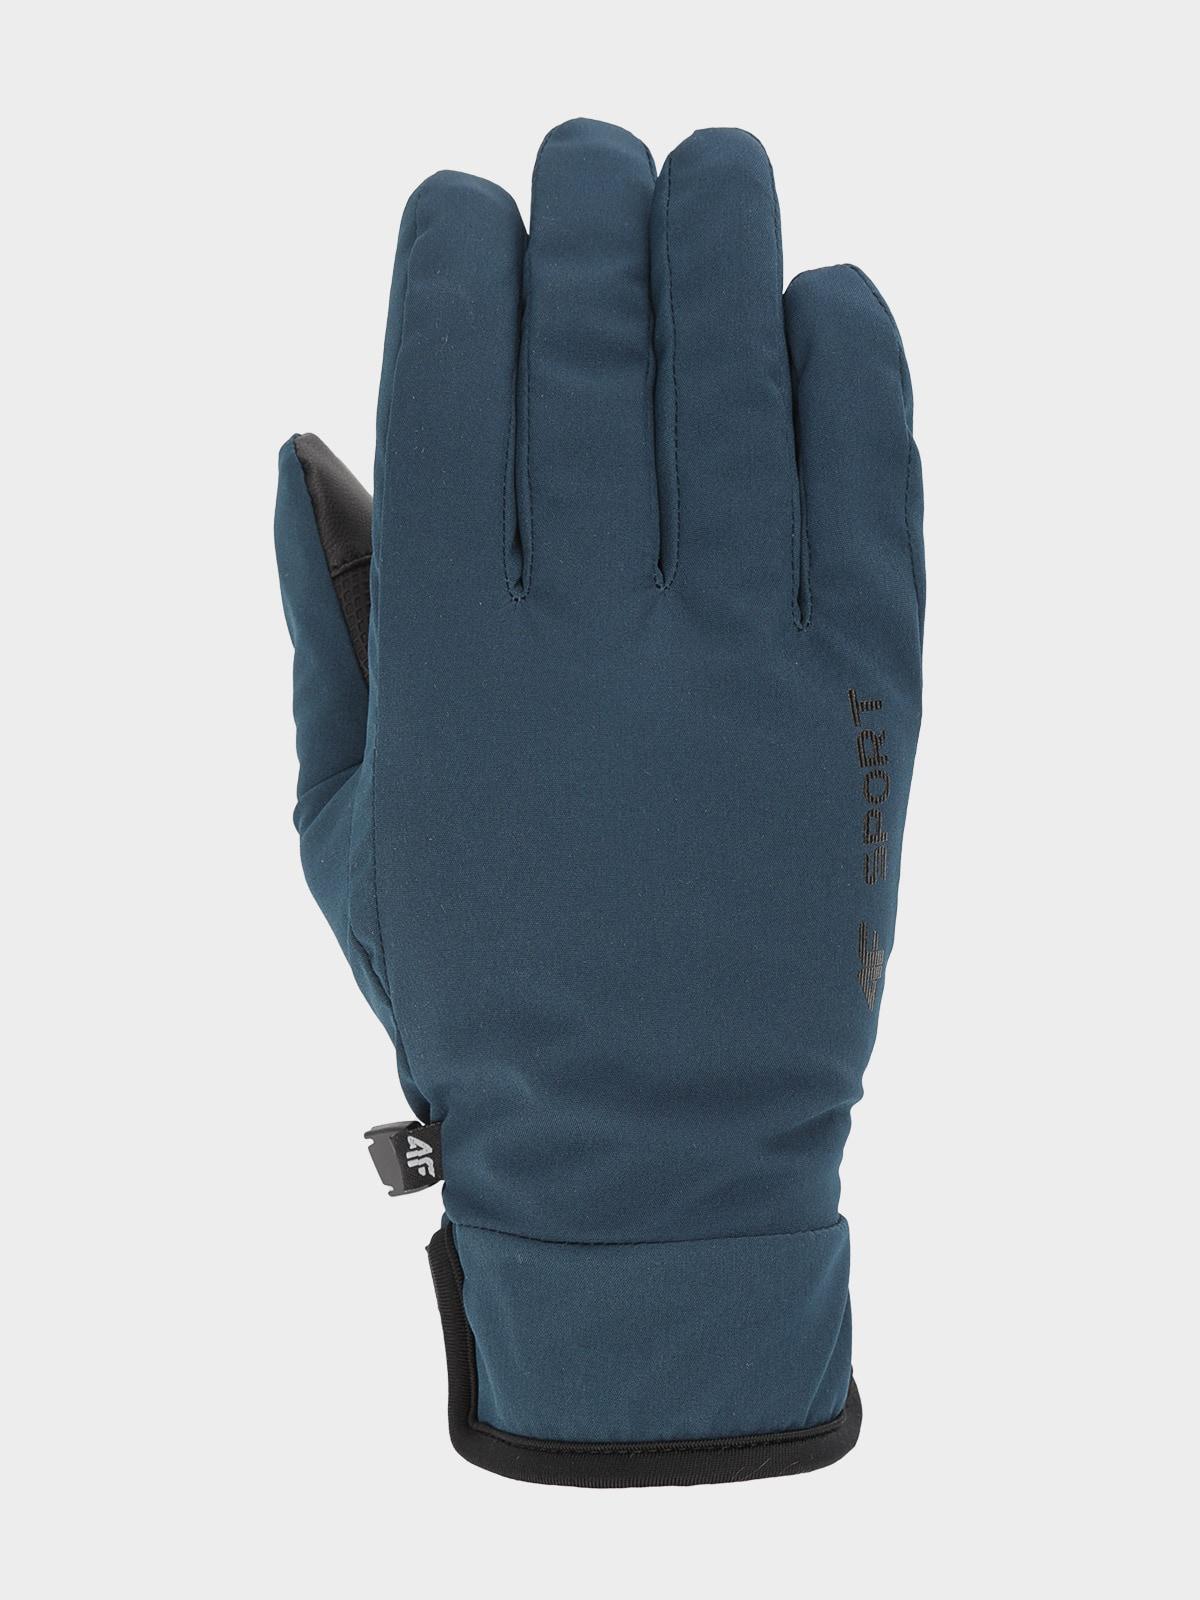 Rukavice REU100 - tmavě modrá -